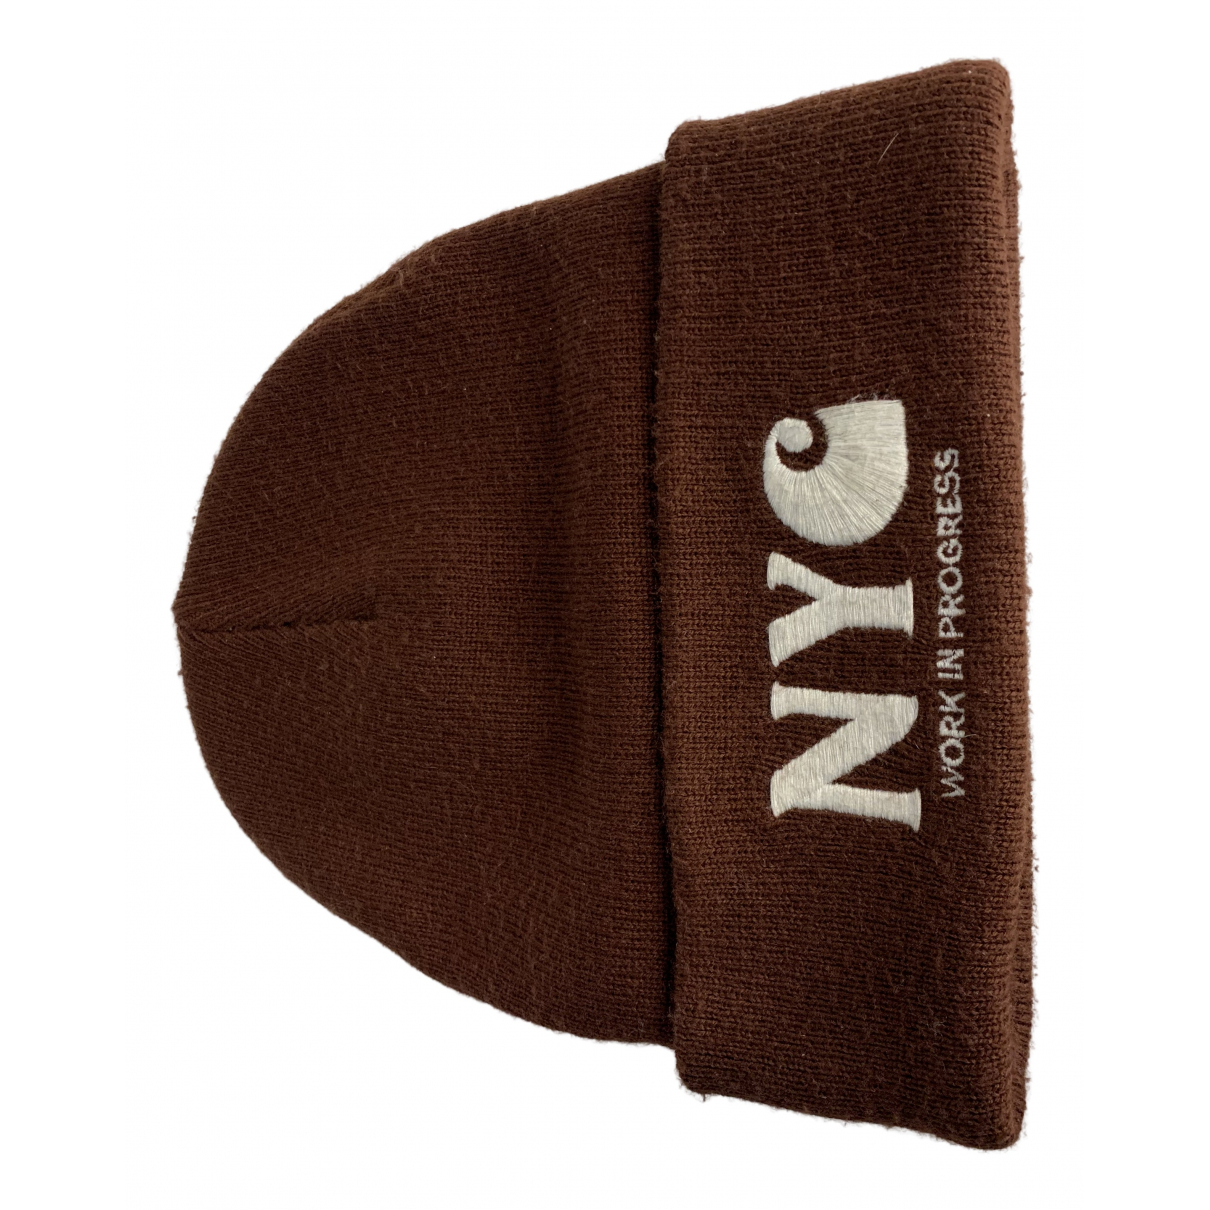 Carhartt Wip N Burgundy Wool hat & pull on hat for Men M International